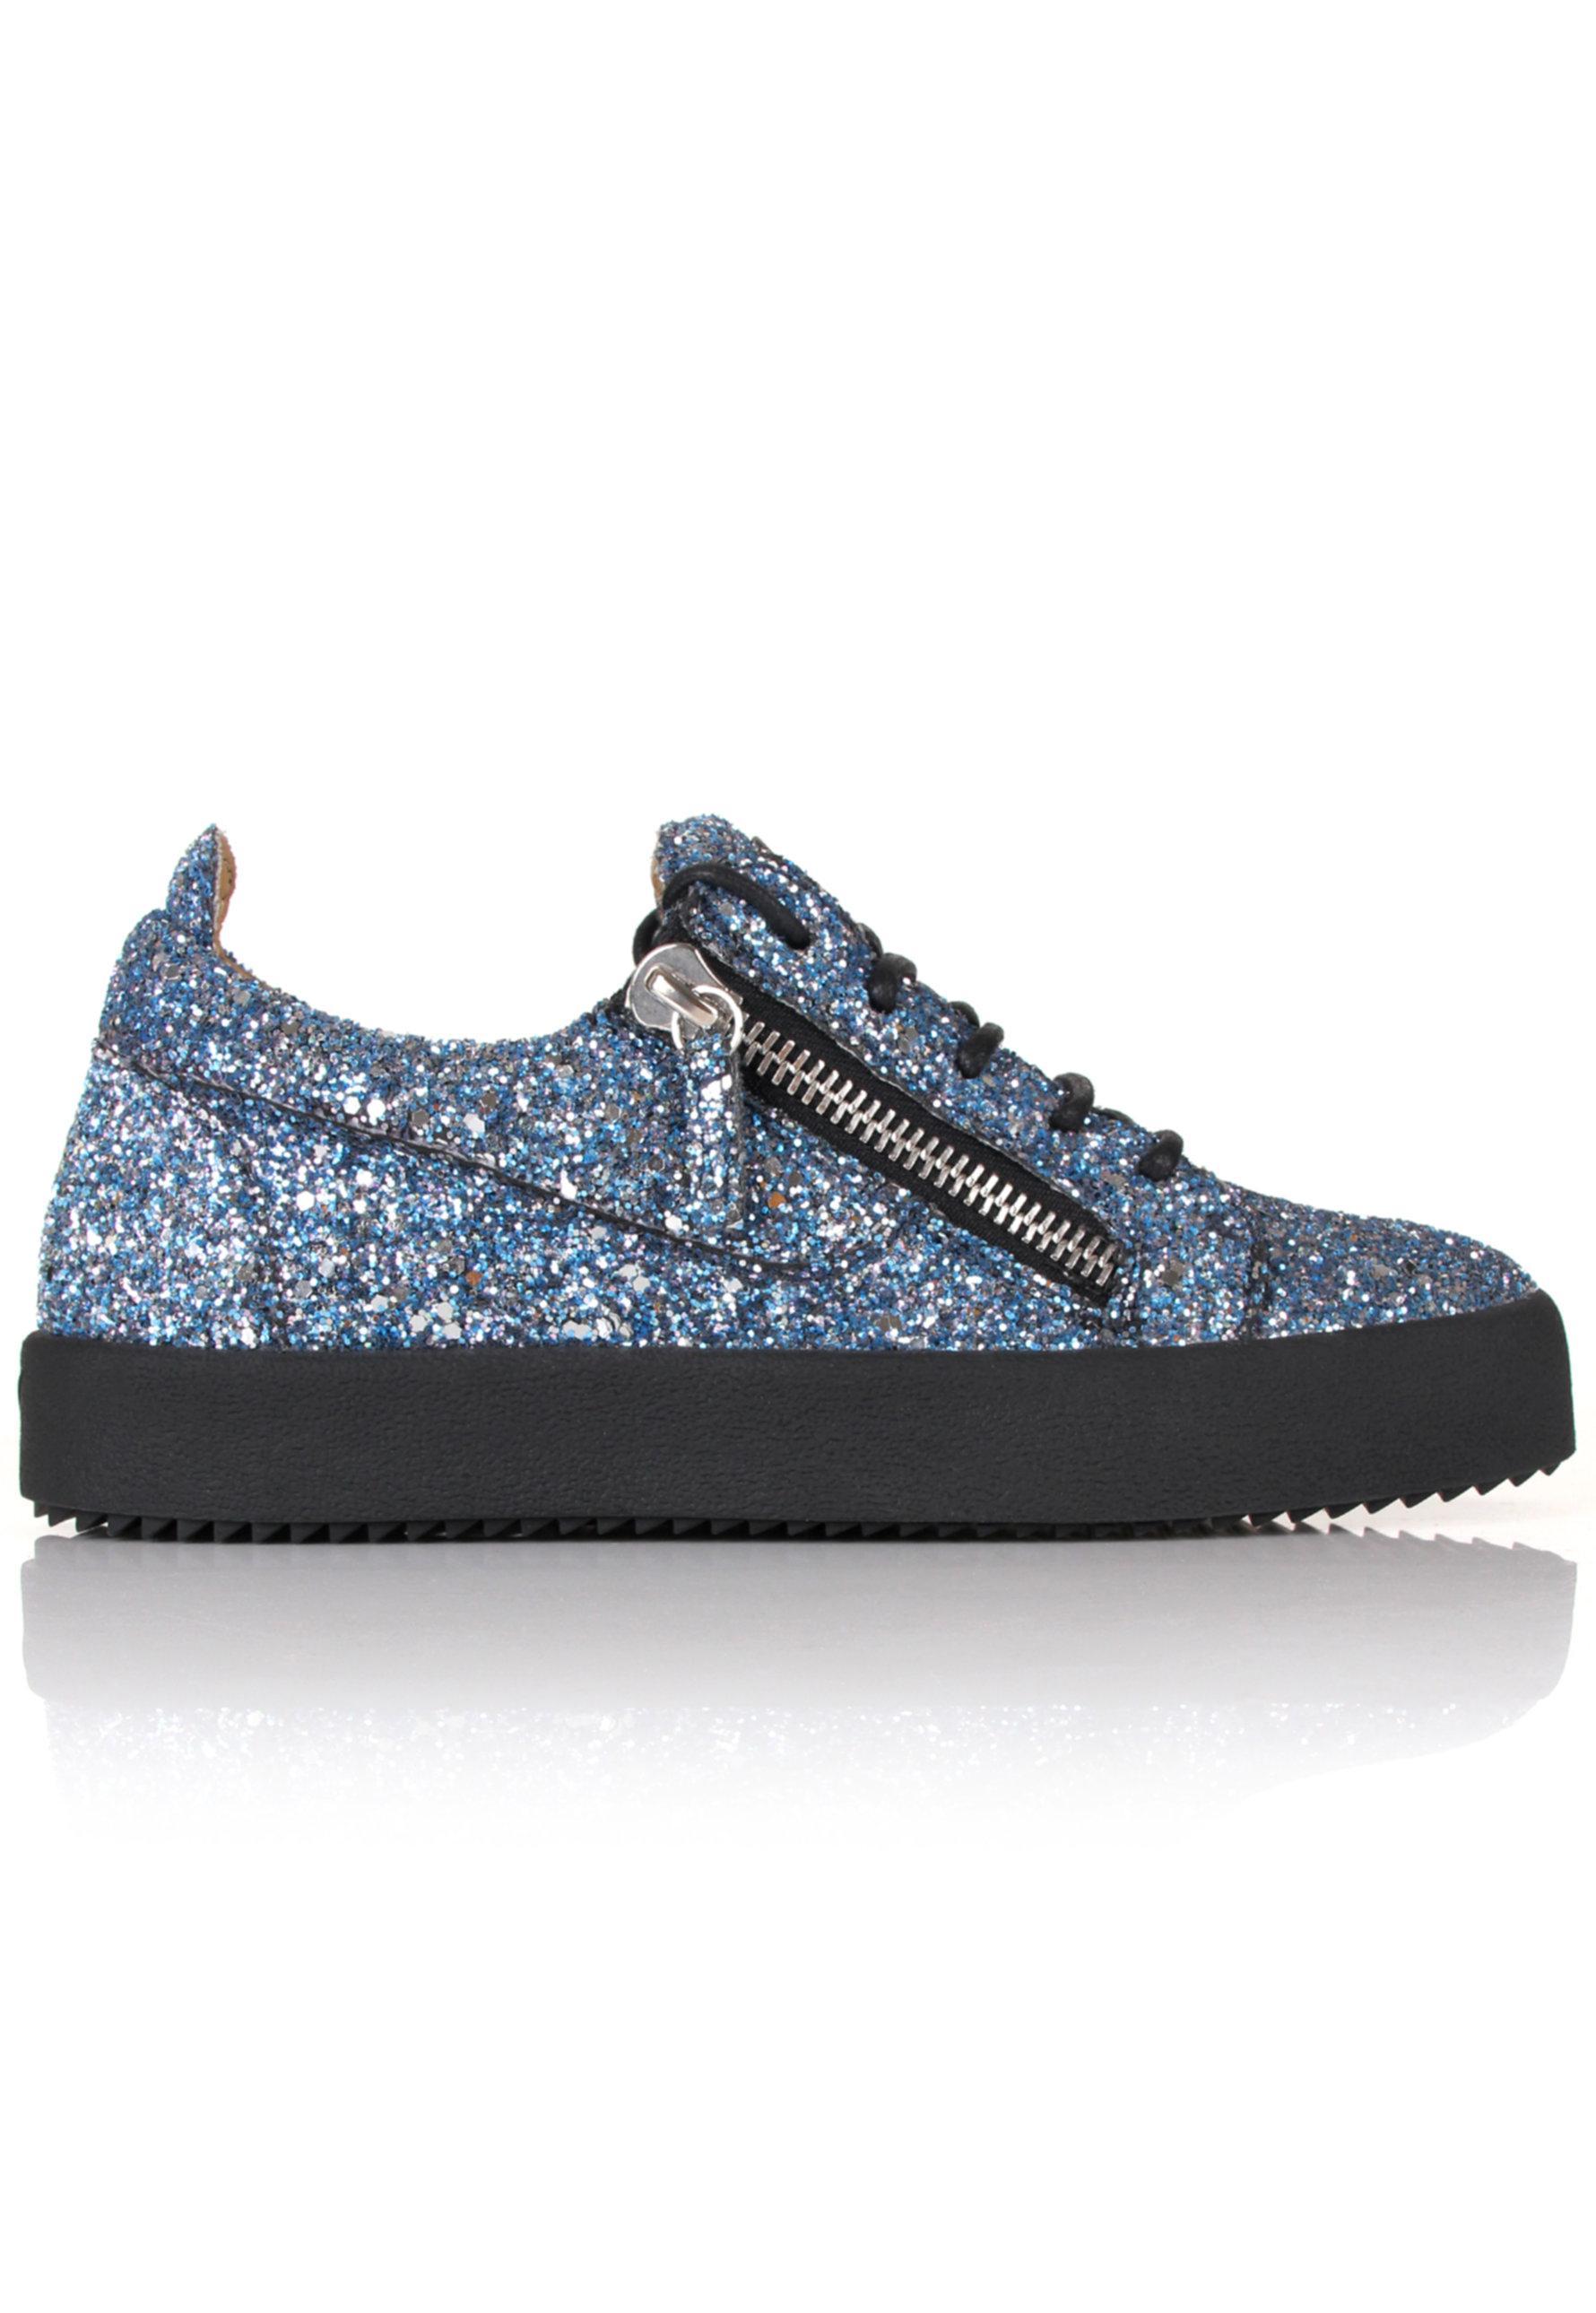 Giuseppe Zanotti Women's Low Top Sneaker nY6sd3VV